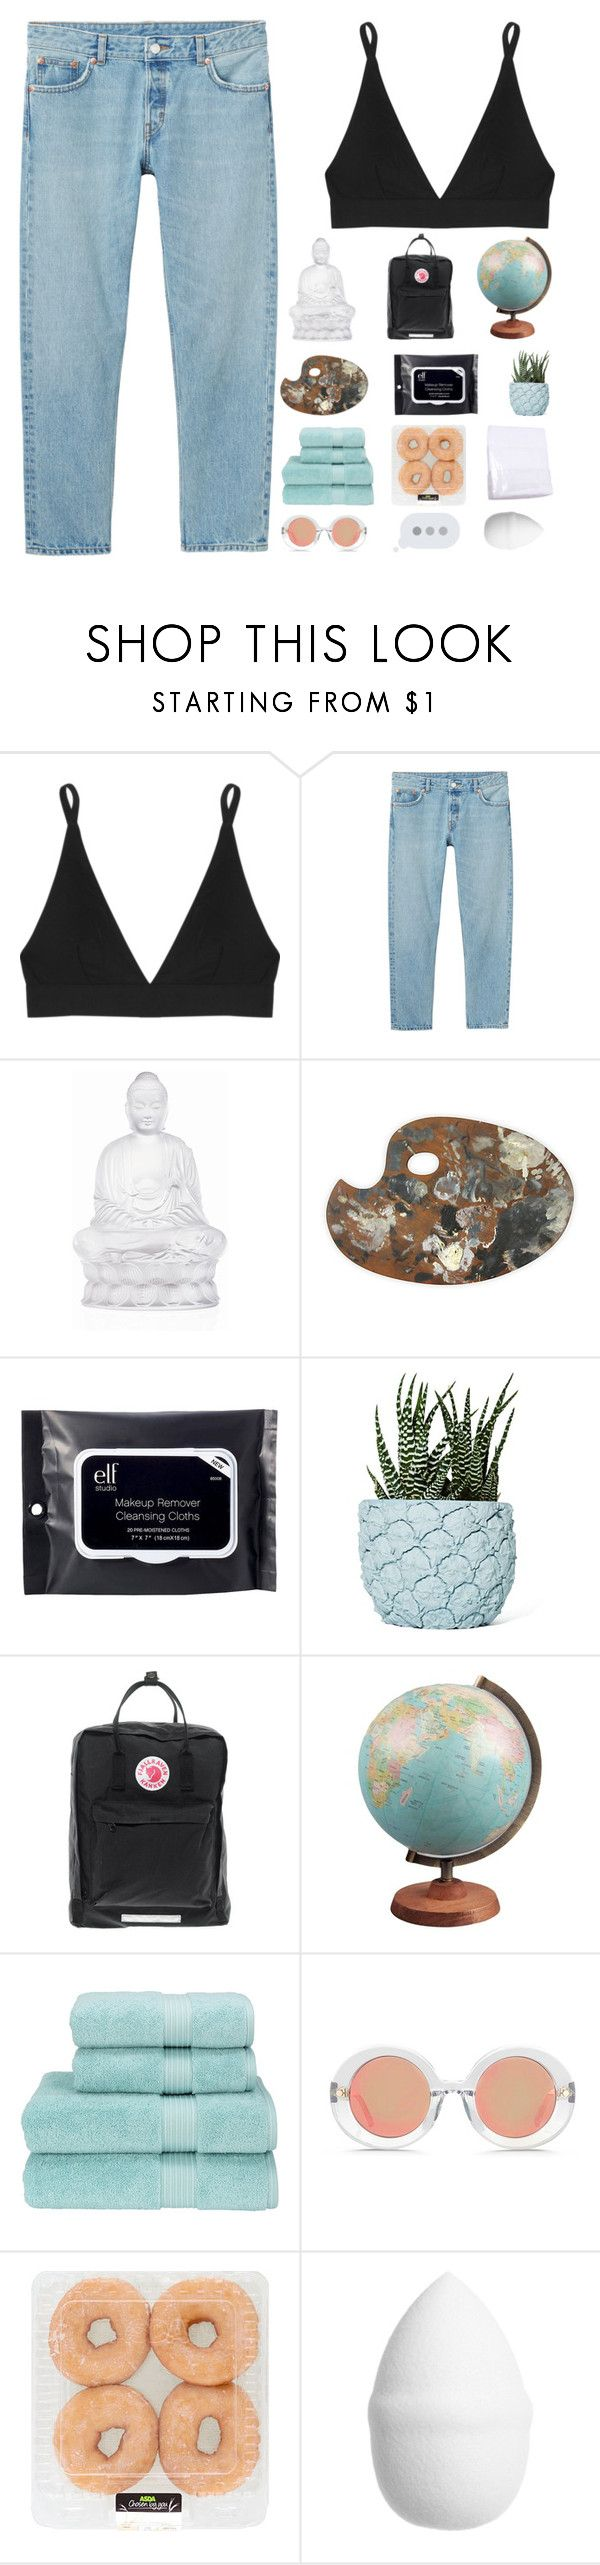 """bad reputation | ♡"" by titaniium ❤ liked on Polyvore featuring Base Range, Monki, Lalique, e.l.f., Chen Chen & Kai Williams, Fjällräven, Christy, Matthew Williamson and H&M"